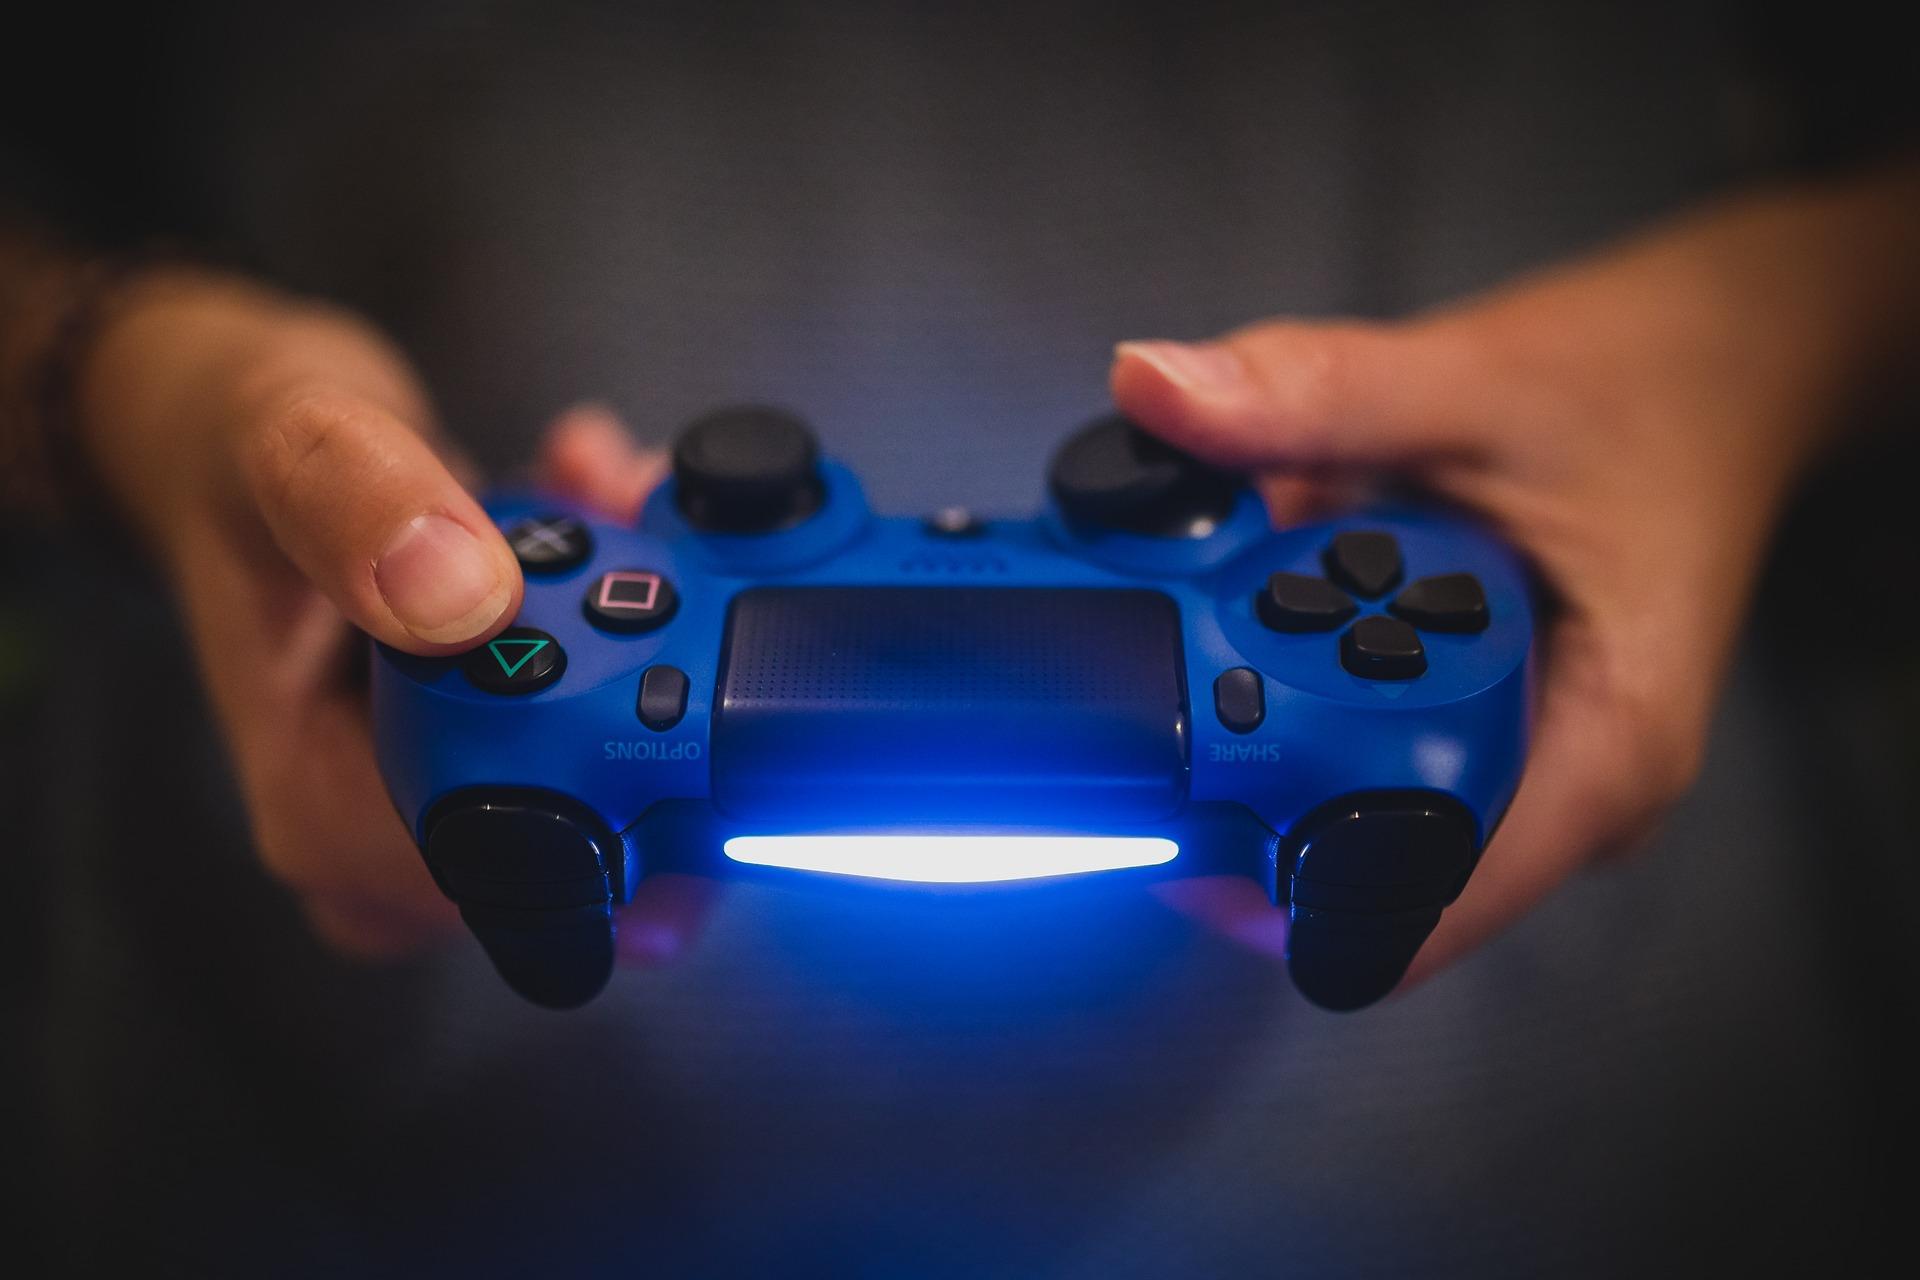 Gaming Controller Ps4 - Schnell gefunden!